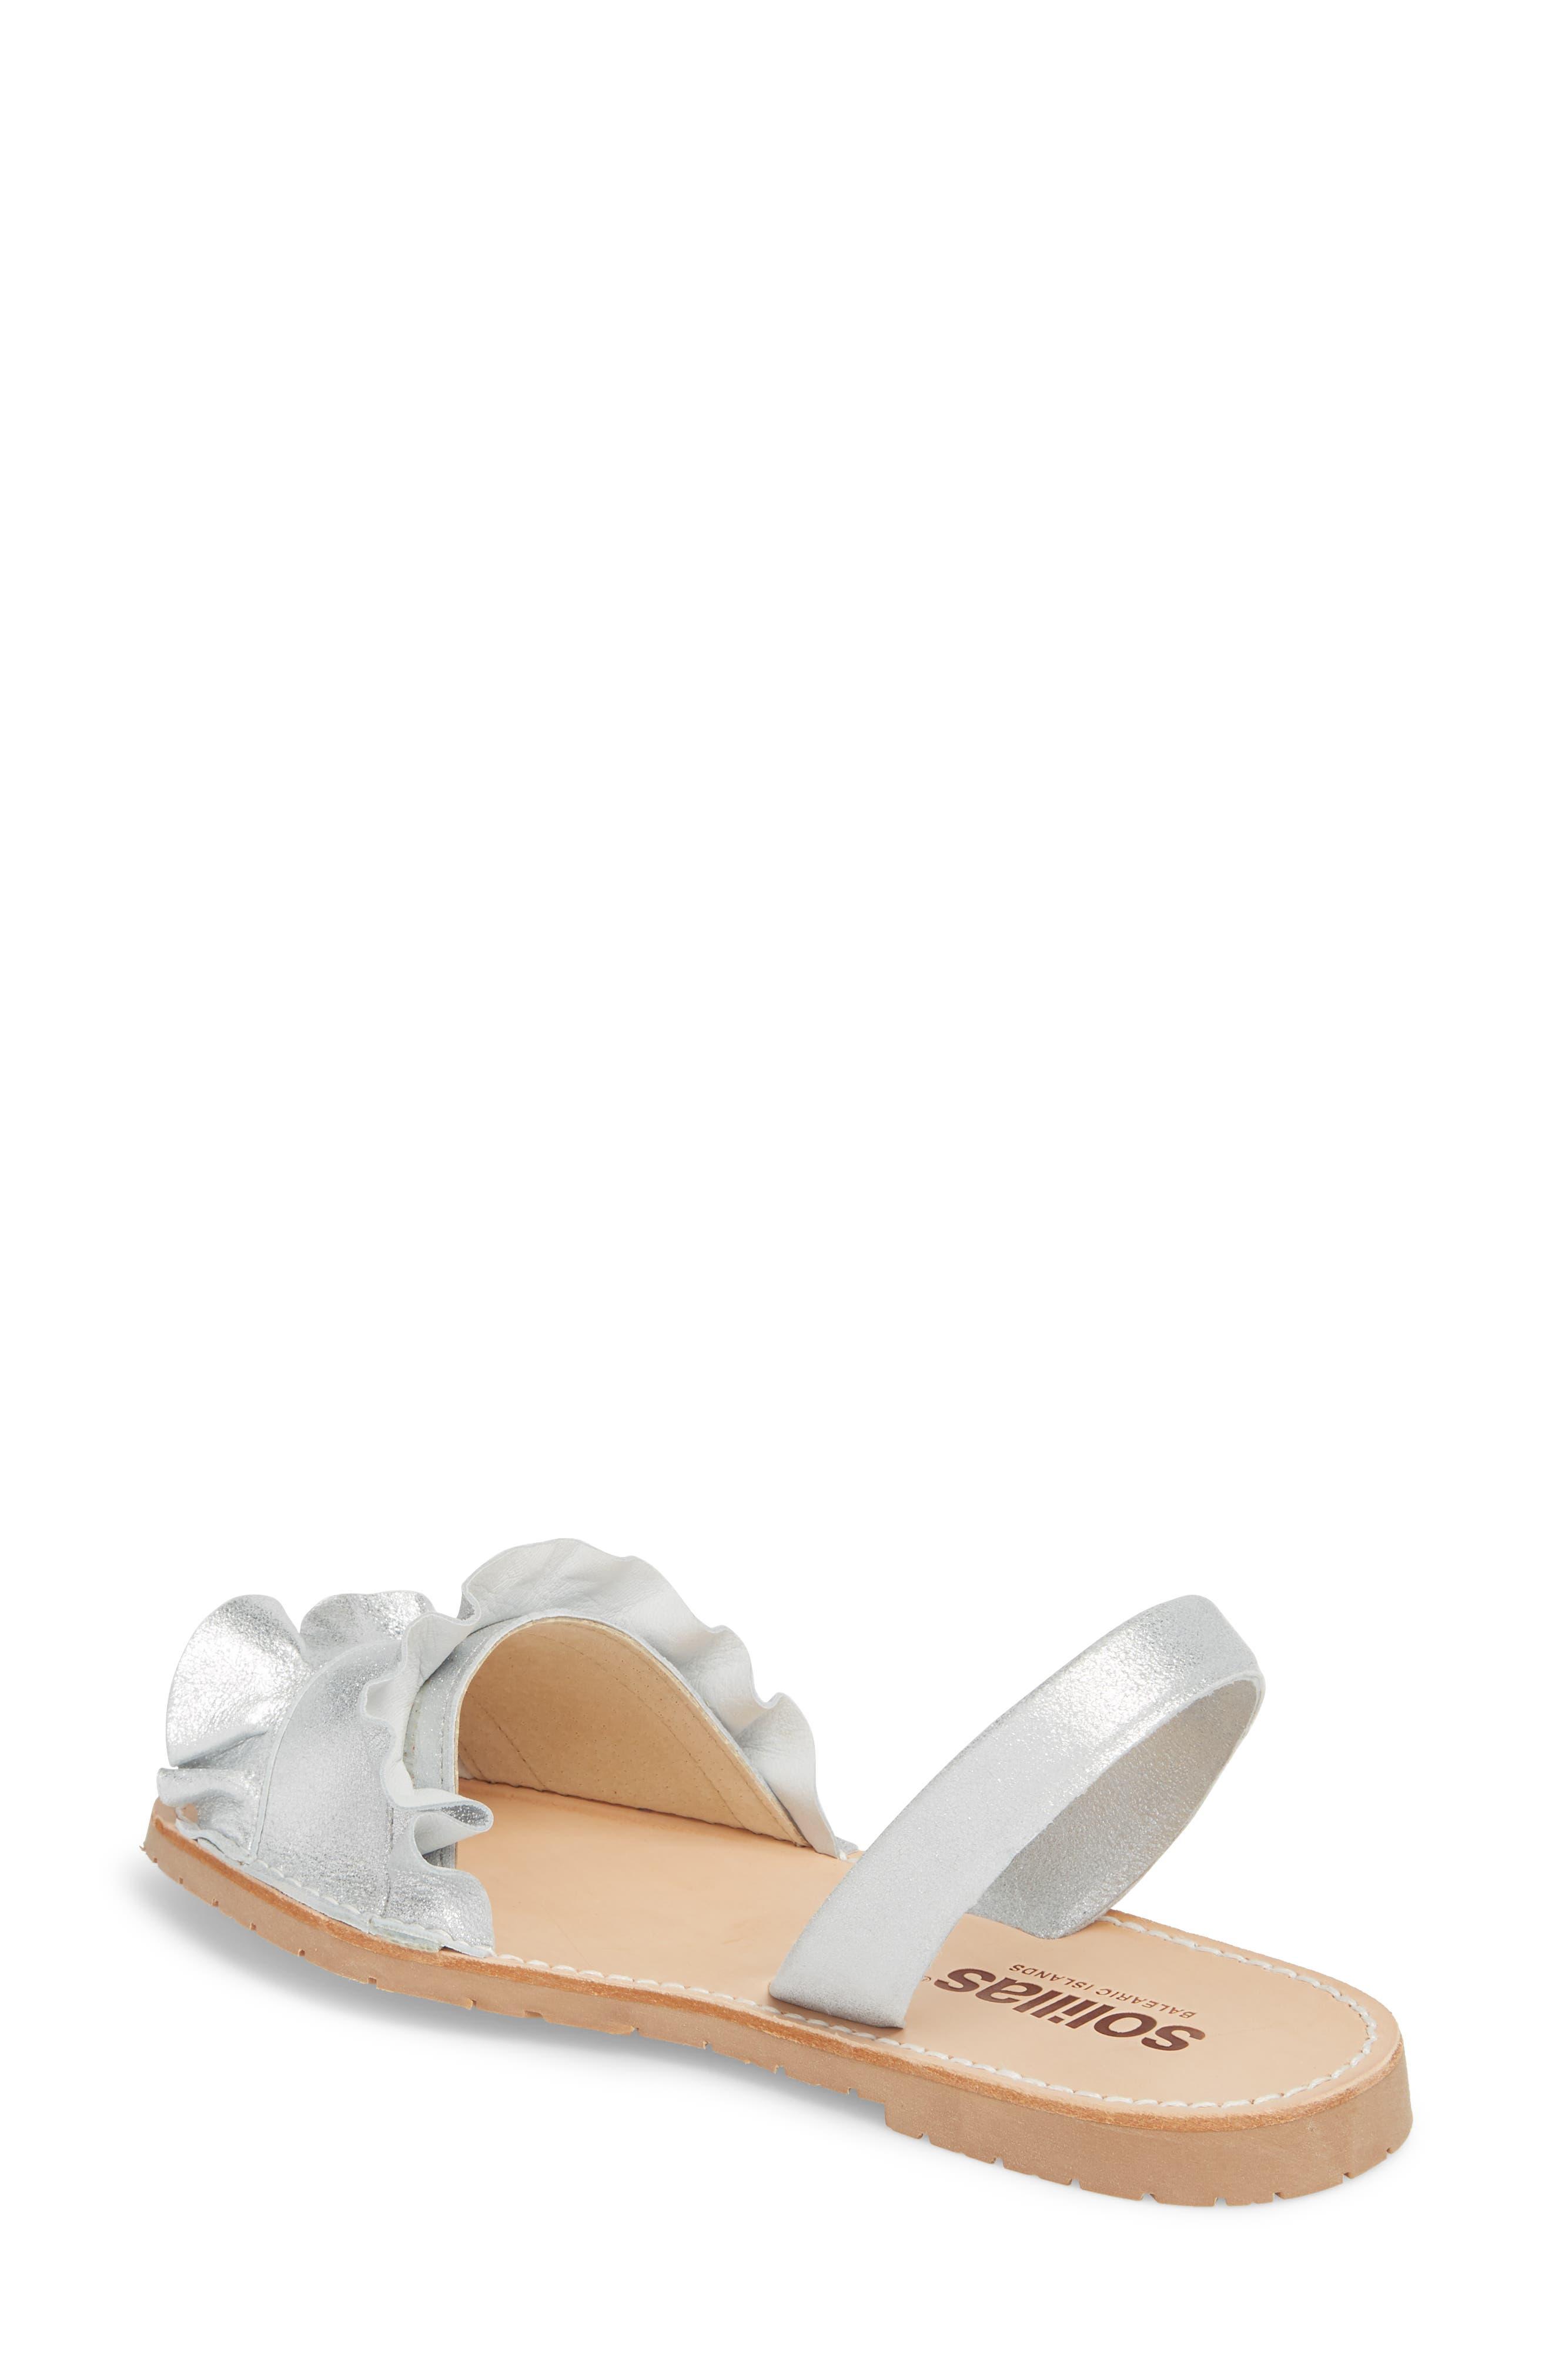 Frilled Flat Sandal,                             Alternate thumbnail 2, color,                             040